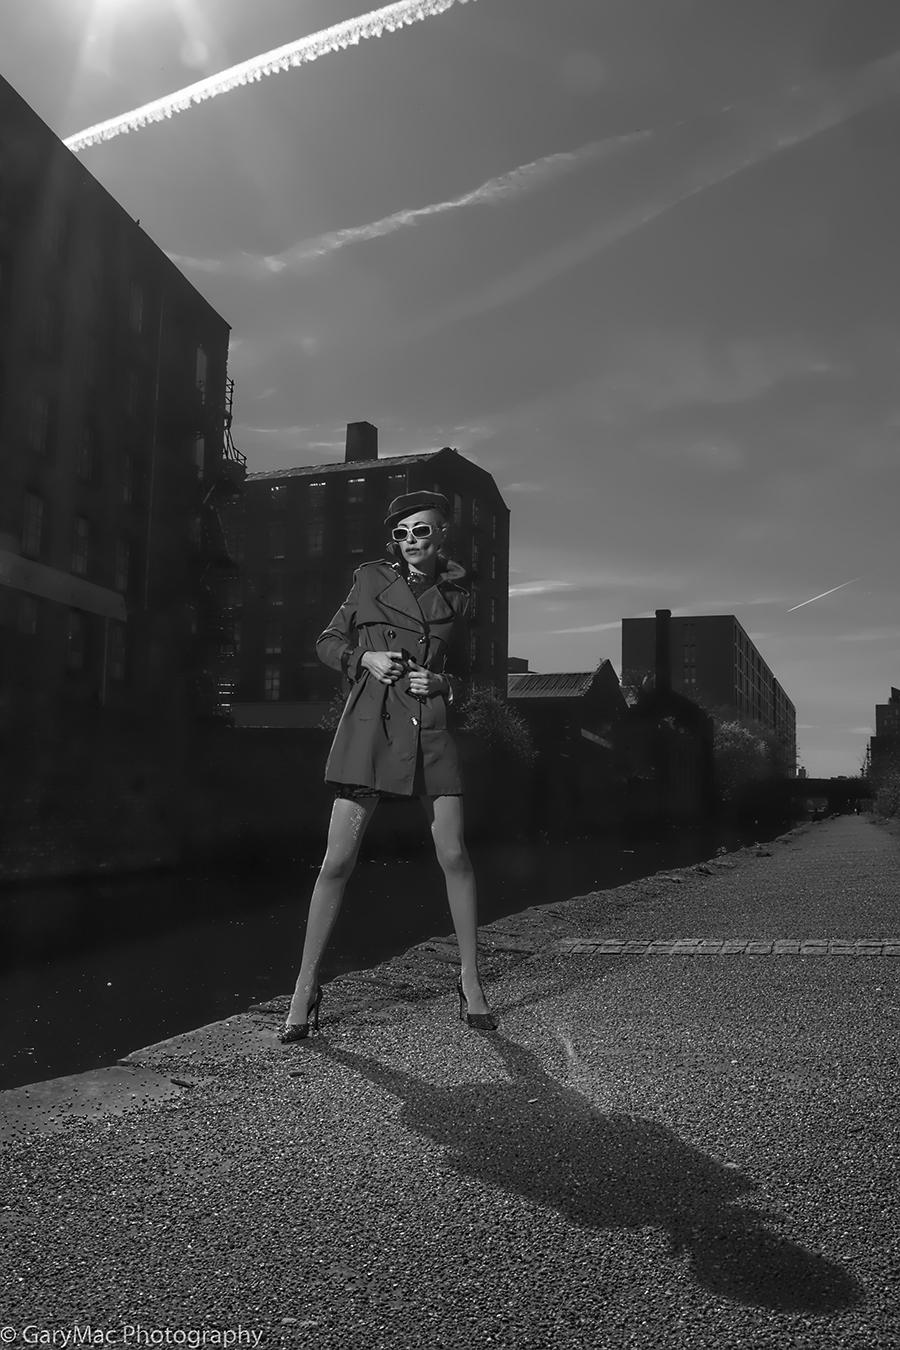 Posing Canal Side / Photography by GaryMac Photography, Model Zara Watson, Taken at Rainbow Studio / Uploaded 26th March 2017 @ 07:55 AM